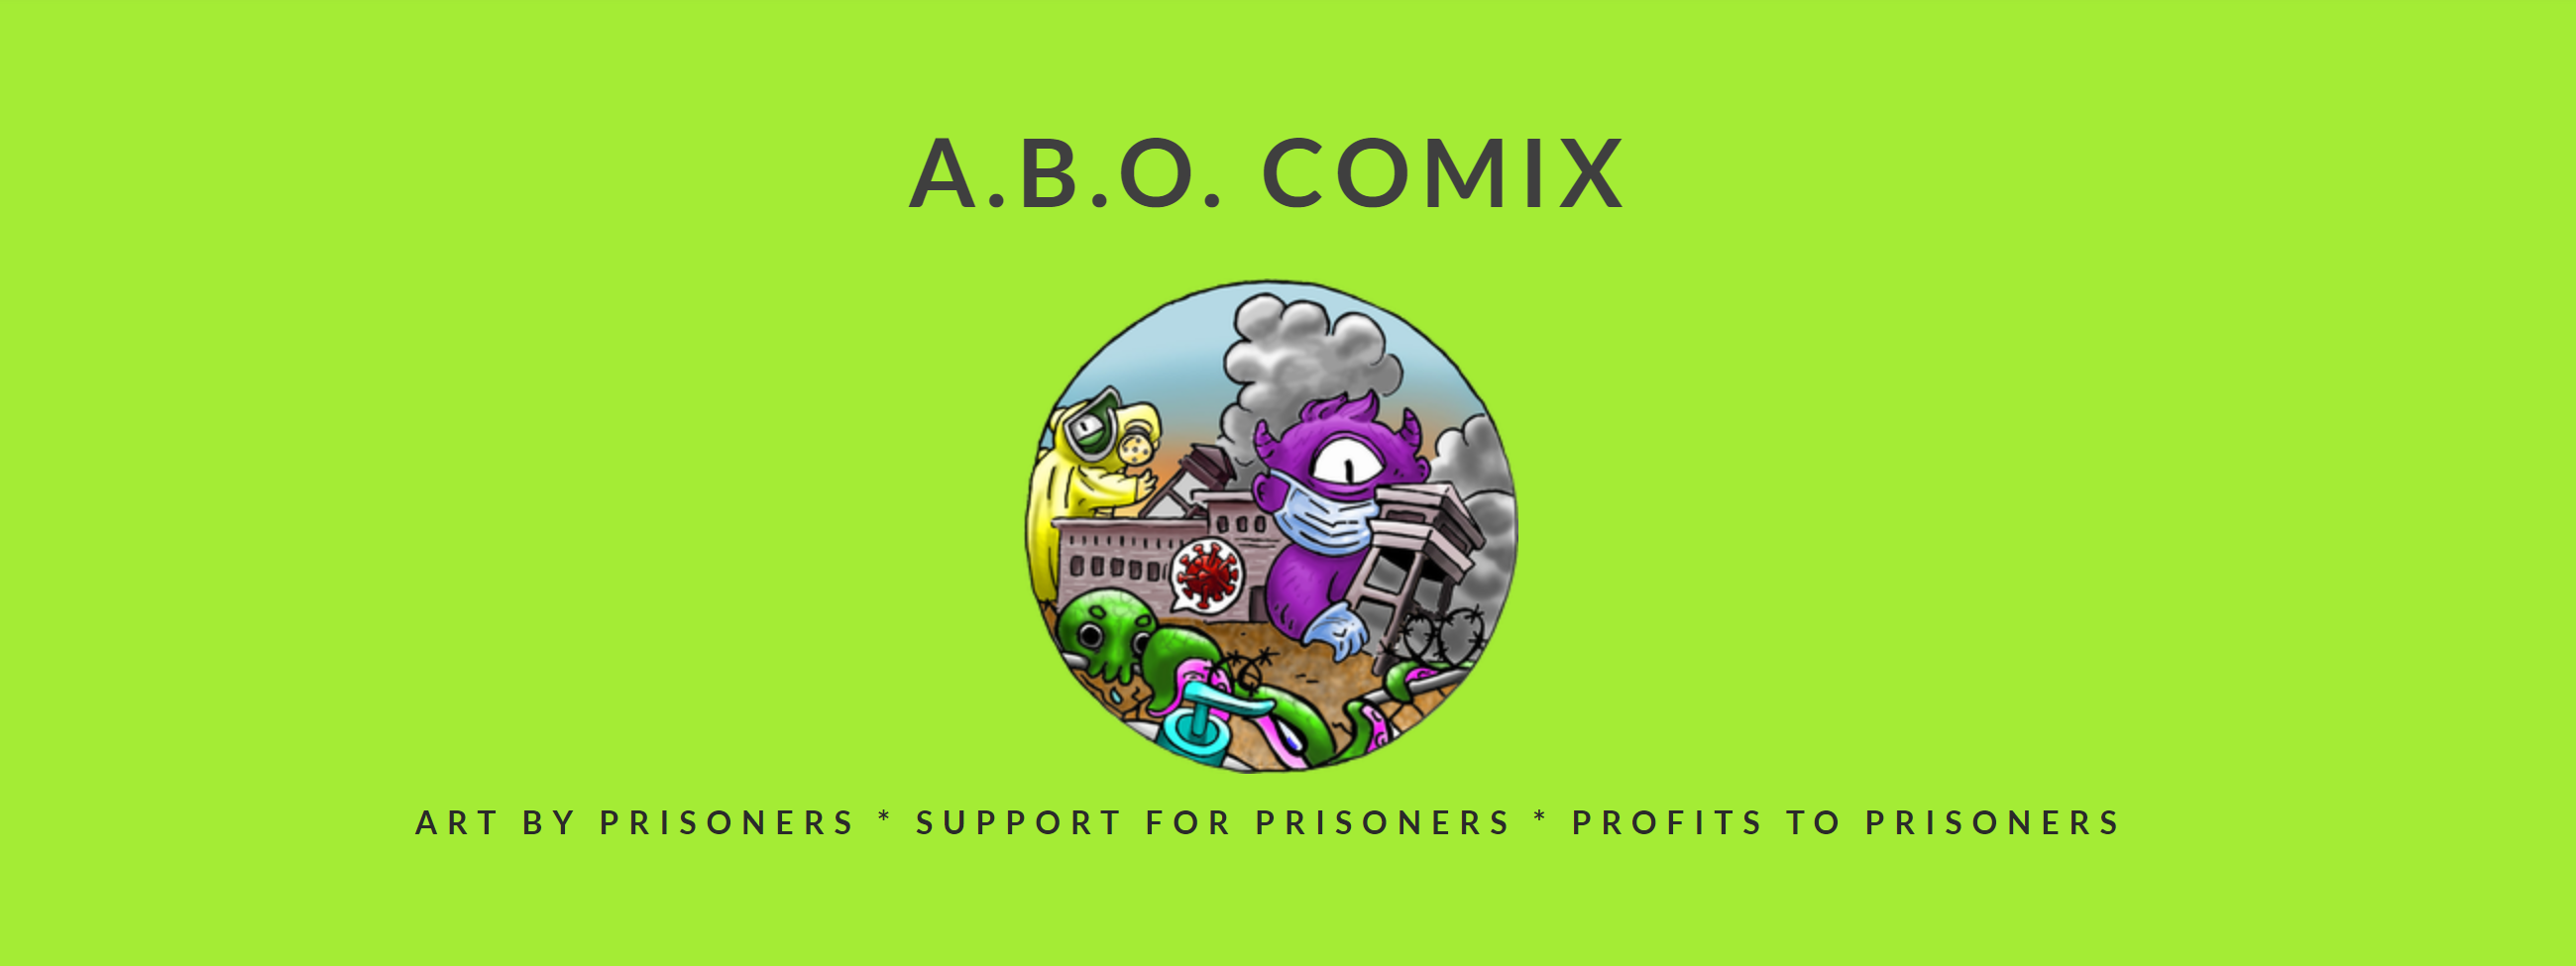 A.B.O Comix homepage graphic